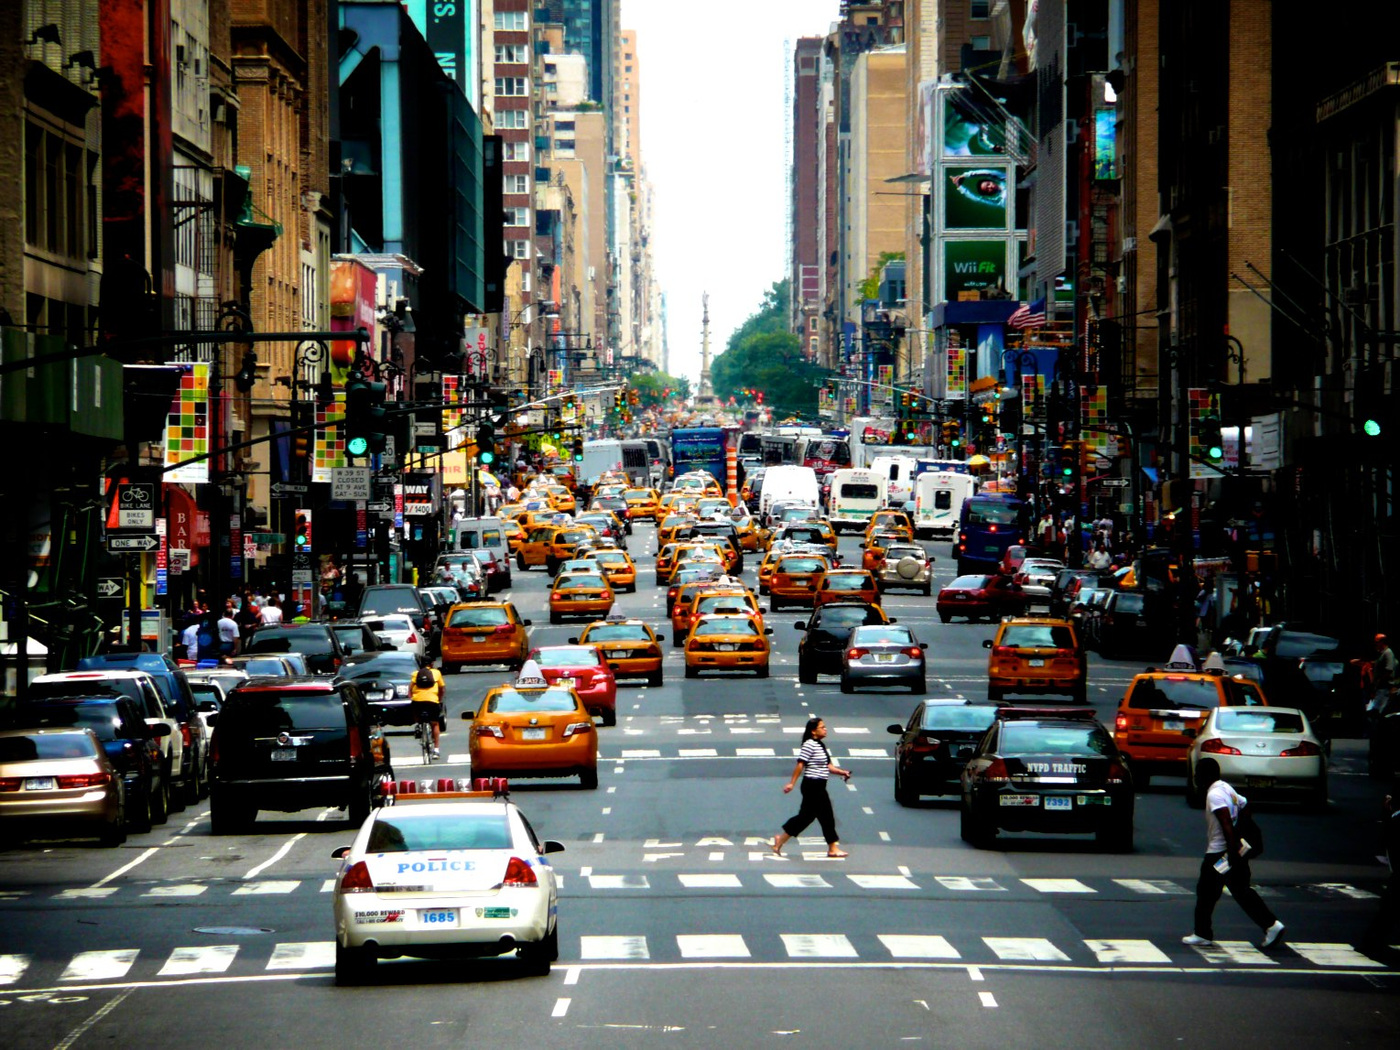 Yotvat Kariti - On the streets of New York